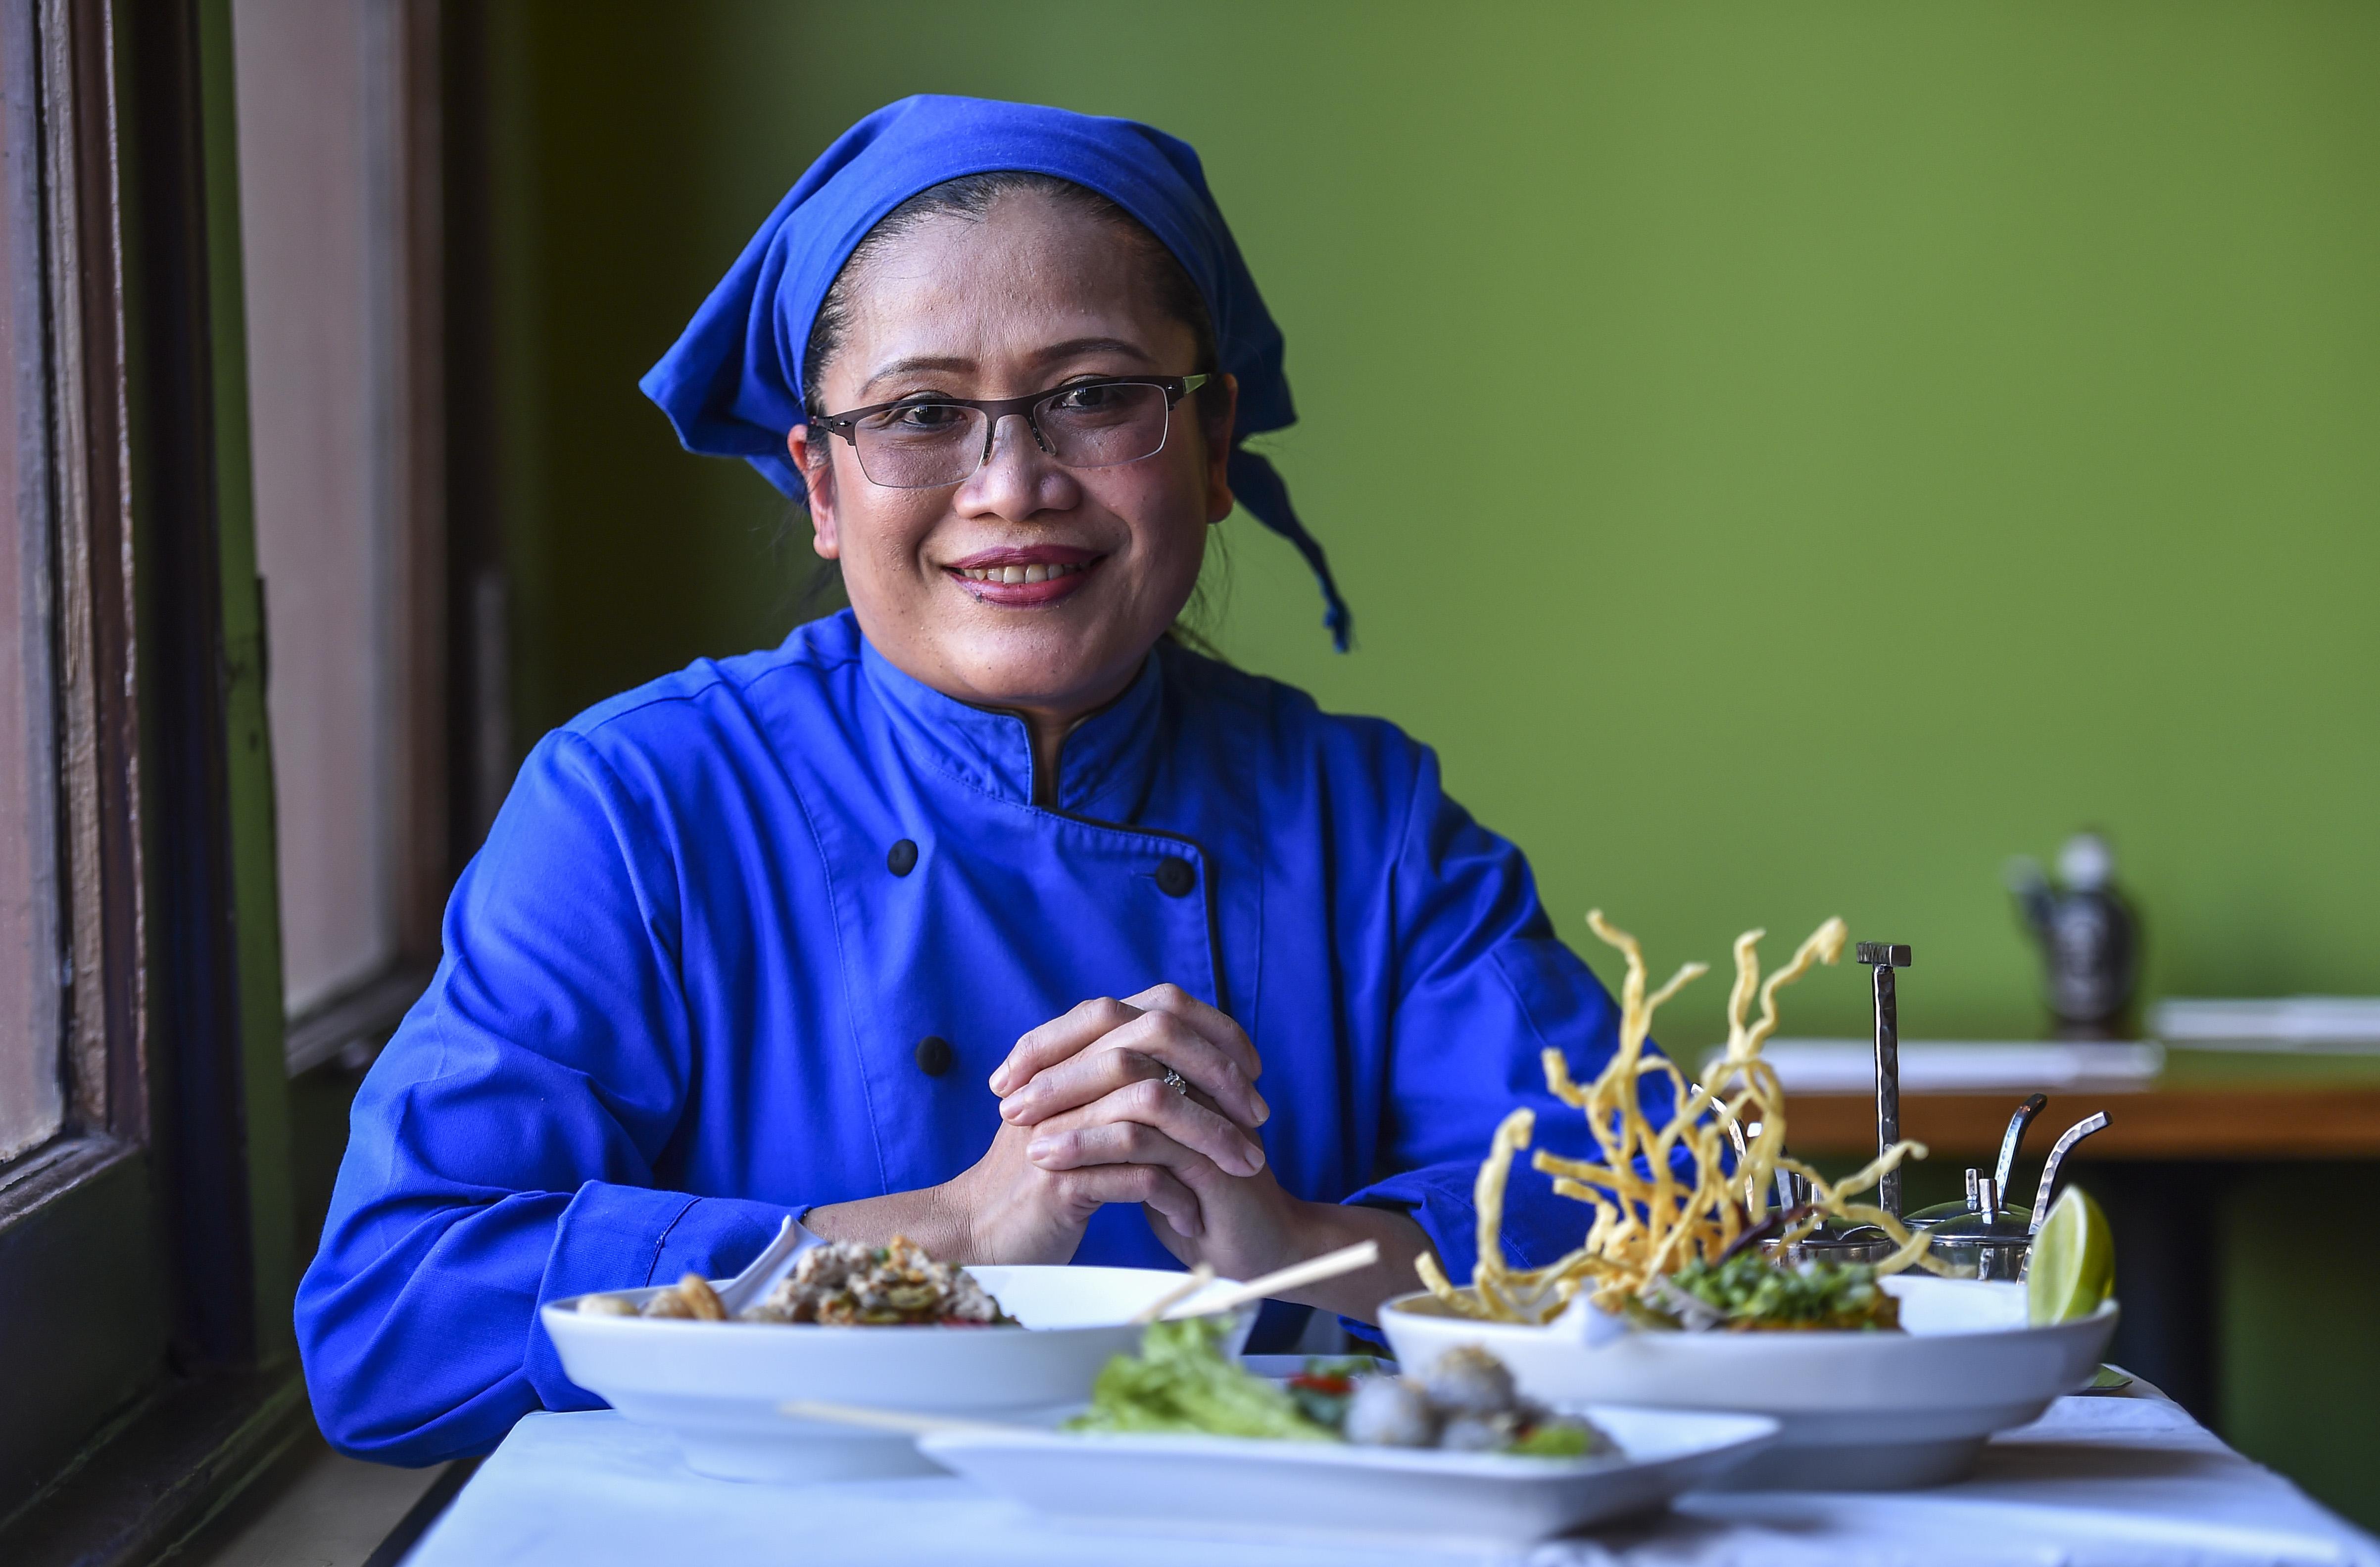 Chef Jeeraporn Poksupthong